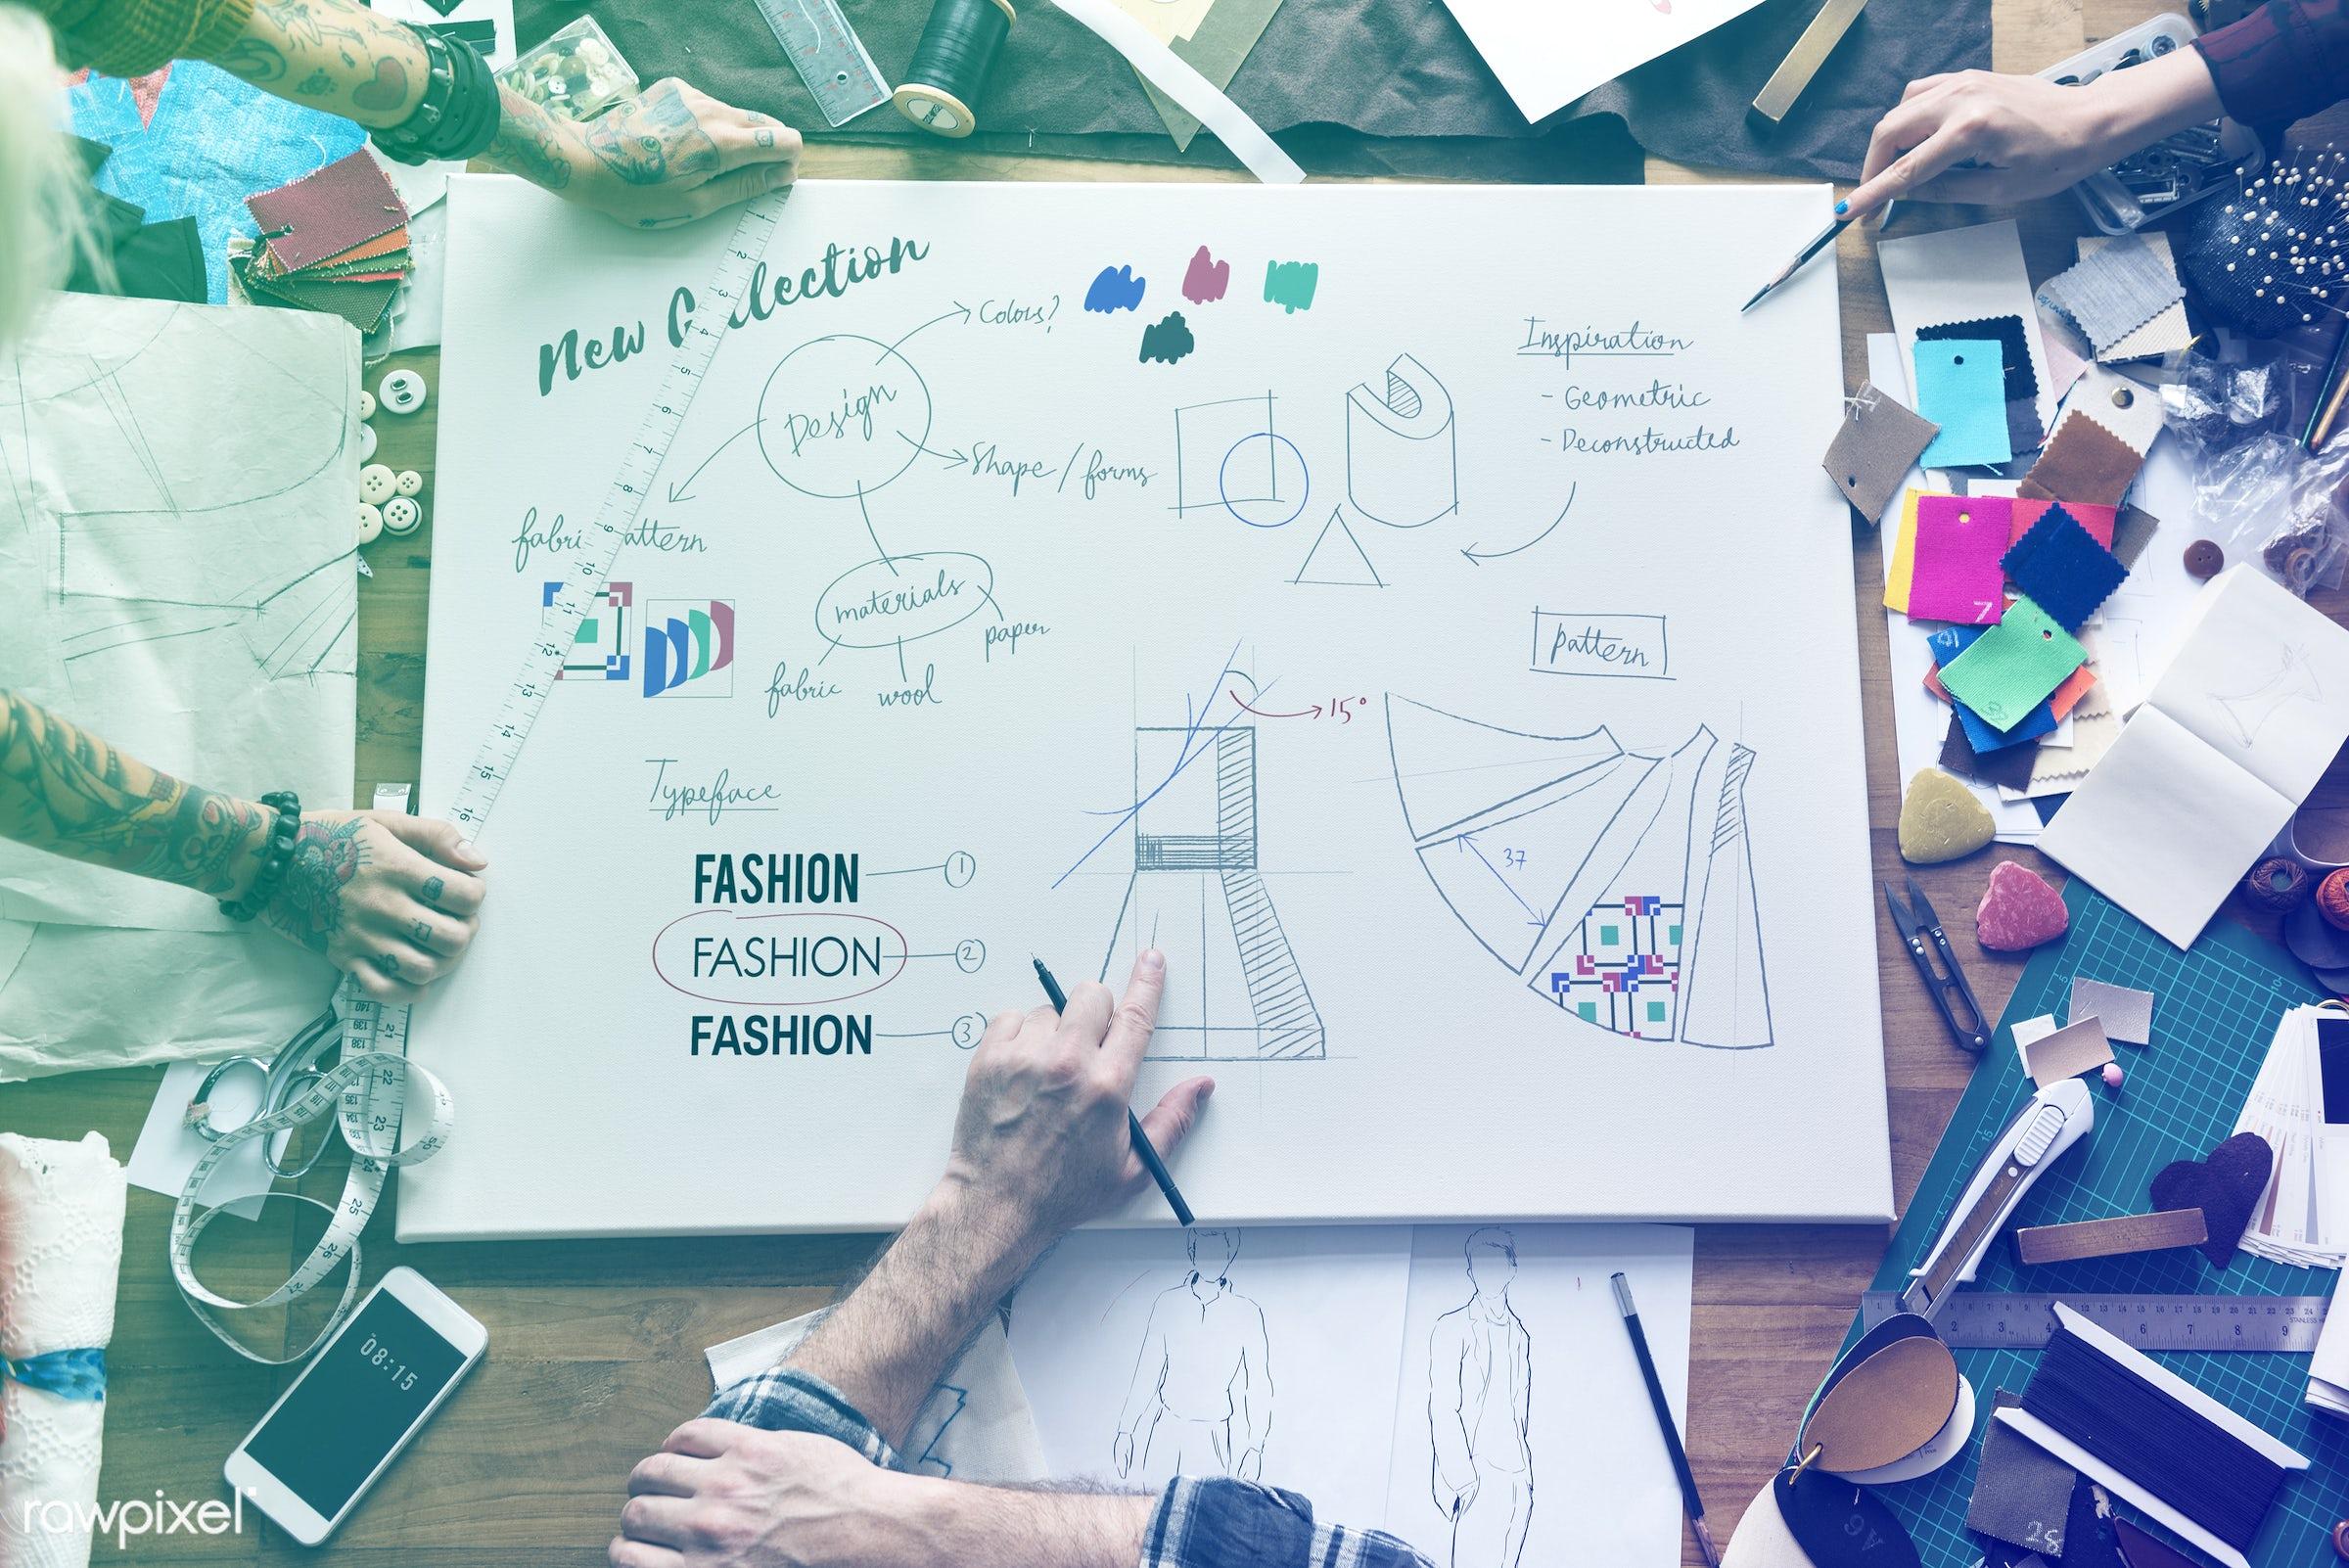 manufacturing, faded, design industry, vibrant, decor, draw, designers, light, shirt, work, workshop, fashion designing,...